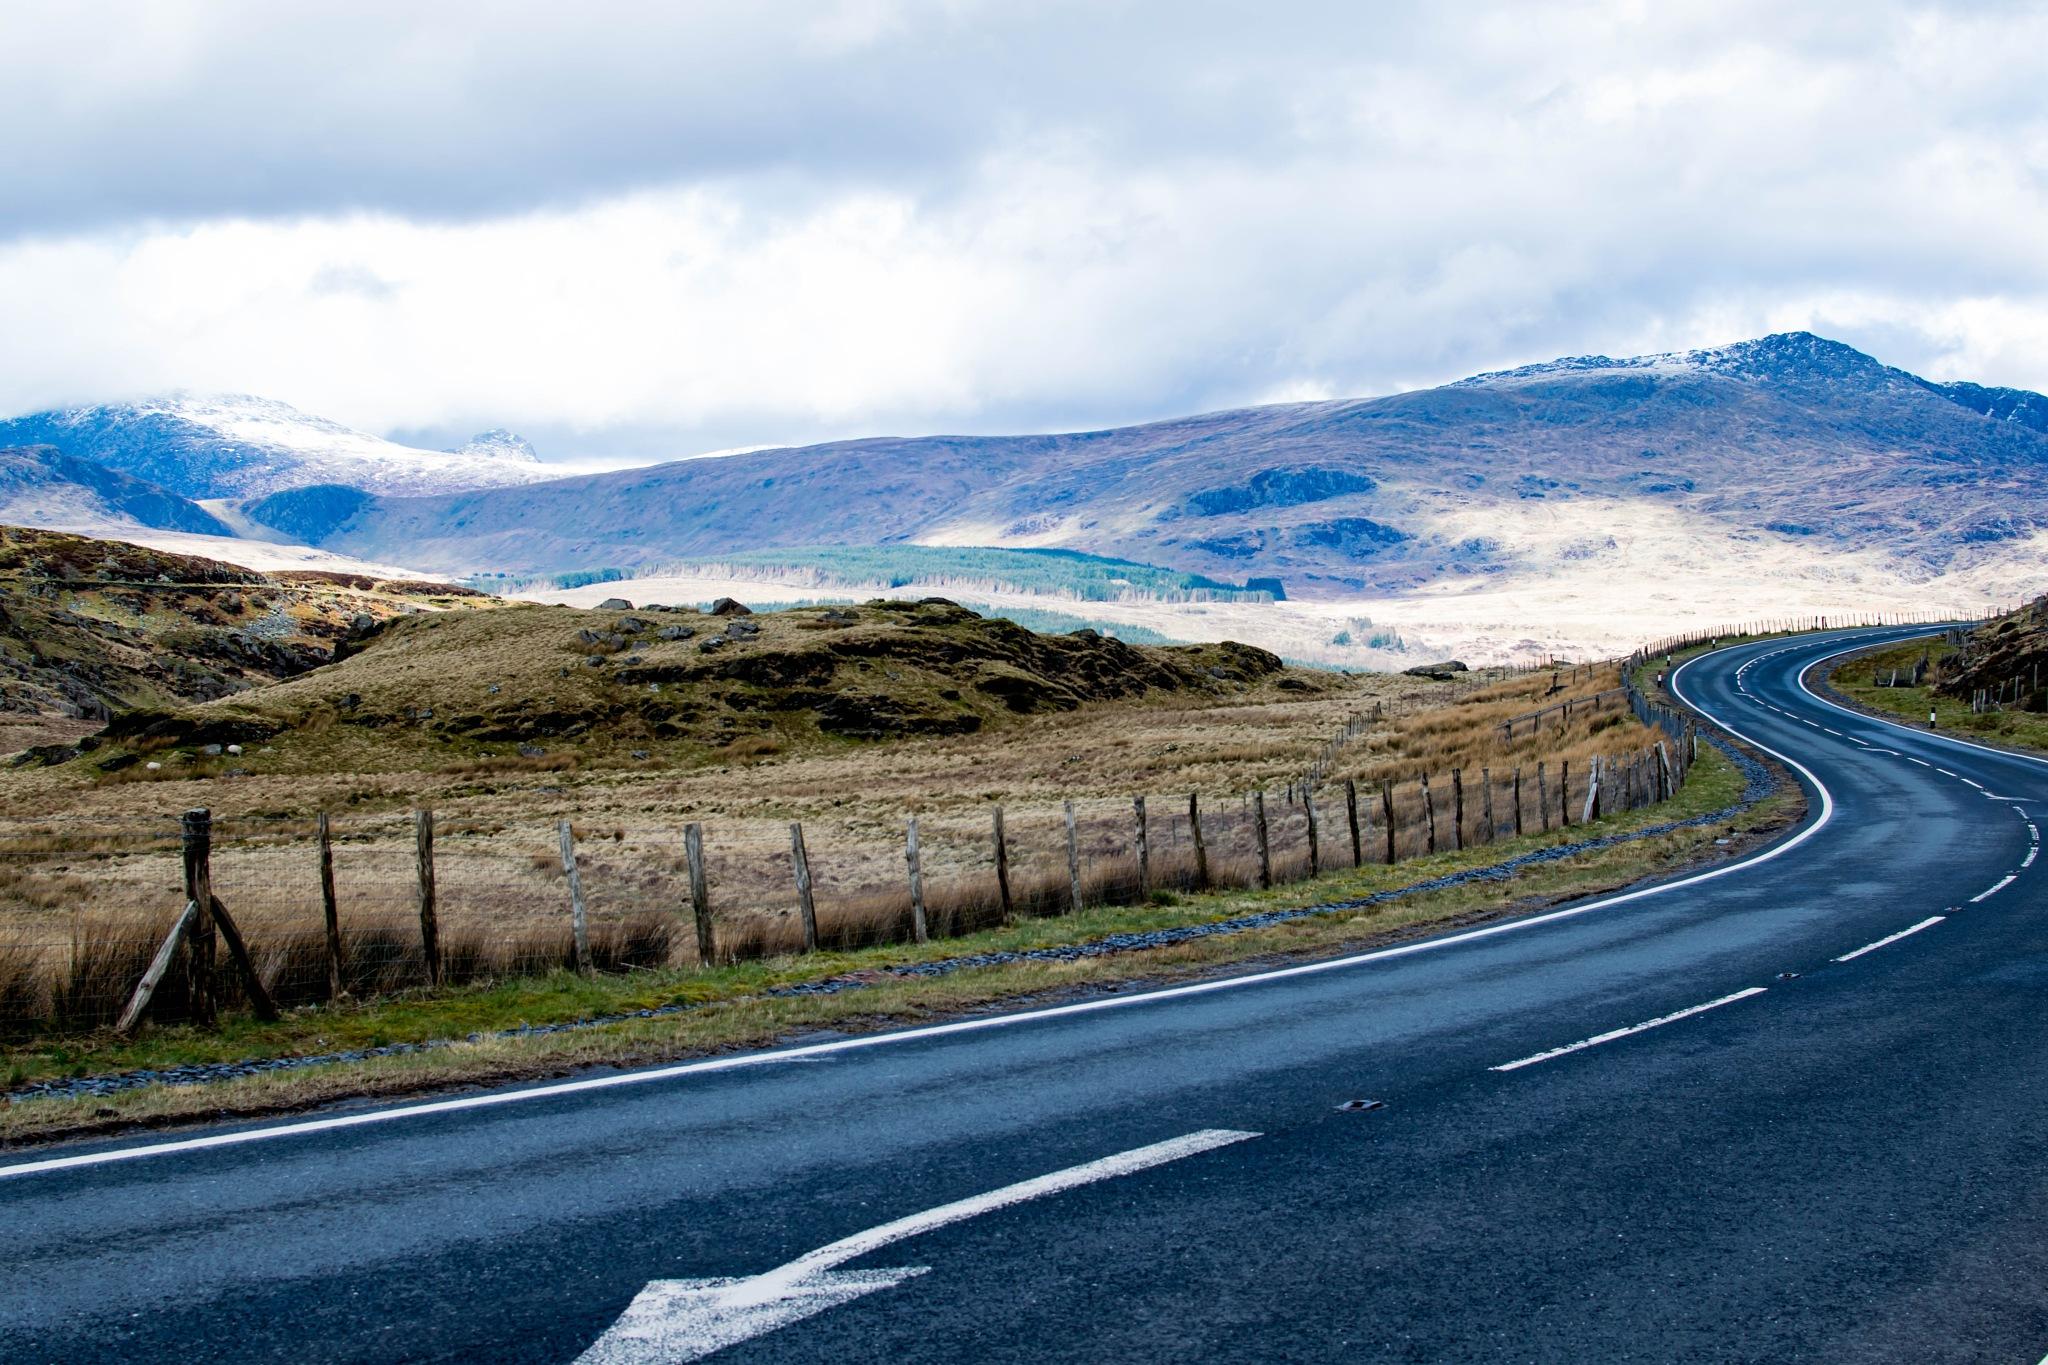 Road in Wales by Saba Safdar